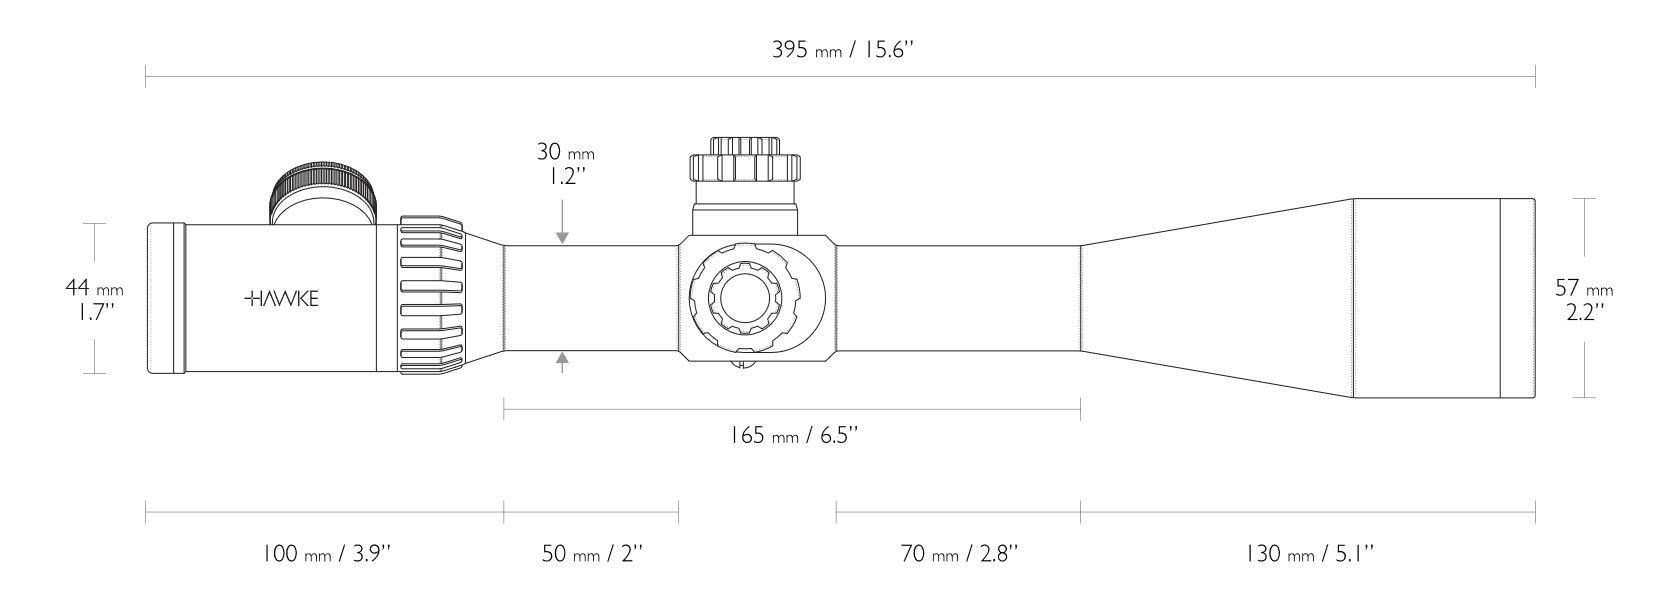 Hawke Sport Optics Airmax 30 6-24x50 Side Focus AMX IR Riflescope by Hawke Sport Optics